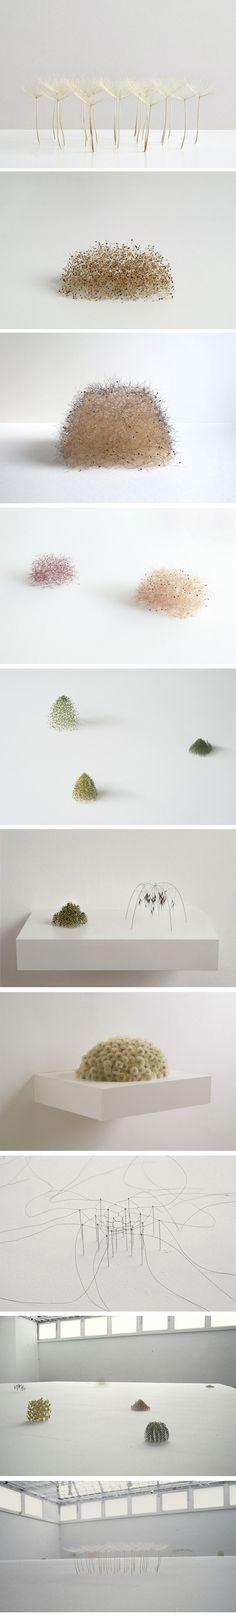 The work of Christiane Löhr Mono Ha, Installation Art, Art Installations, Textile Artists, Art Plastique, Art And Architecture, Contemporary Artists, Art Lessons, Sculpture Art